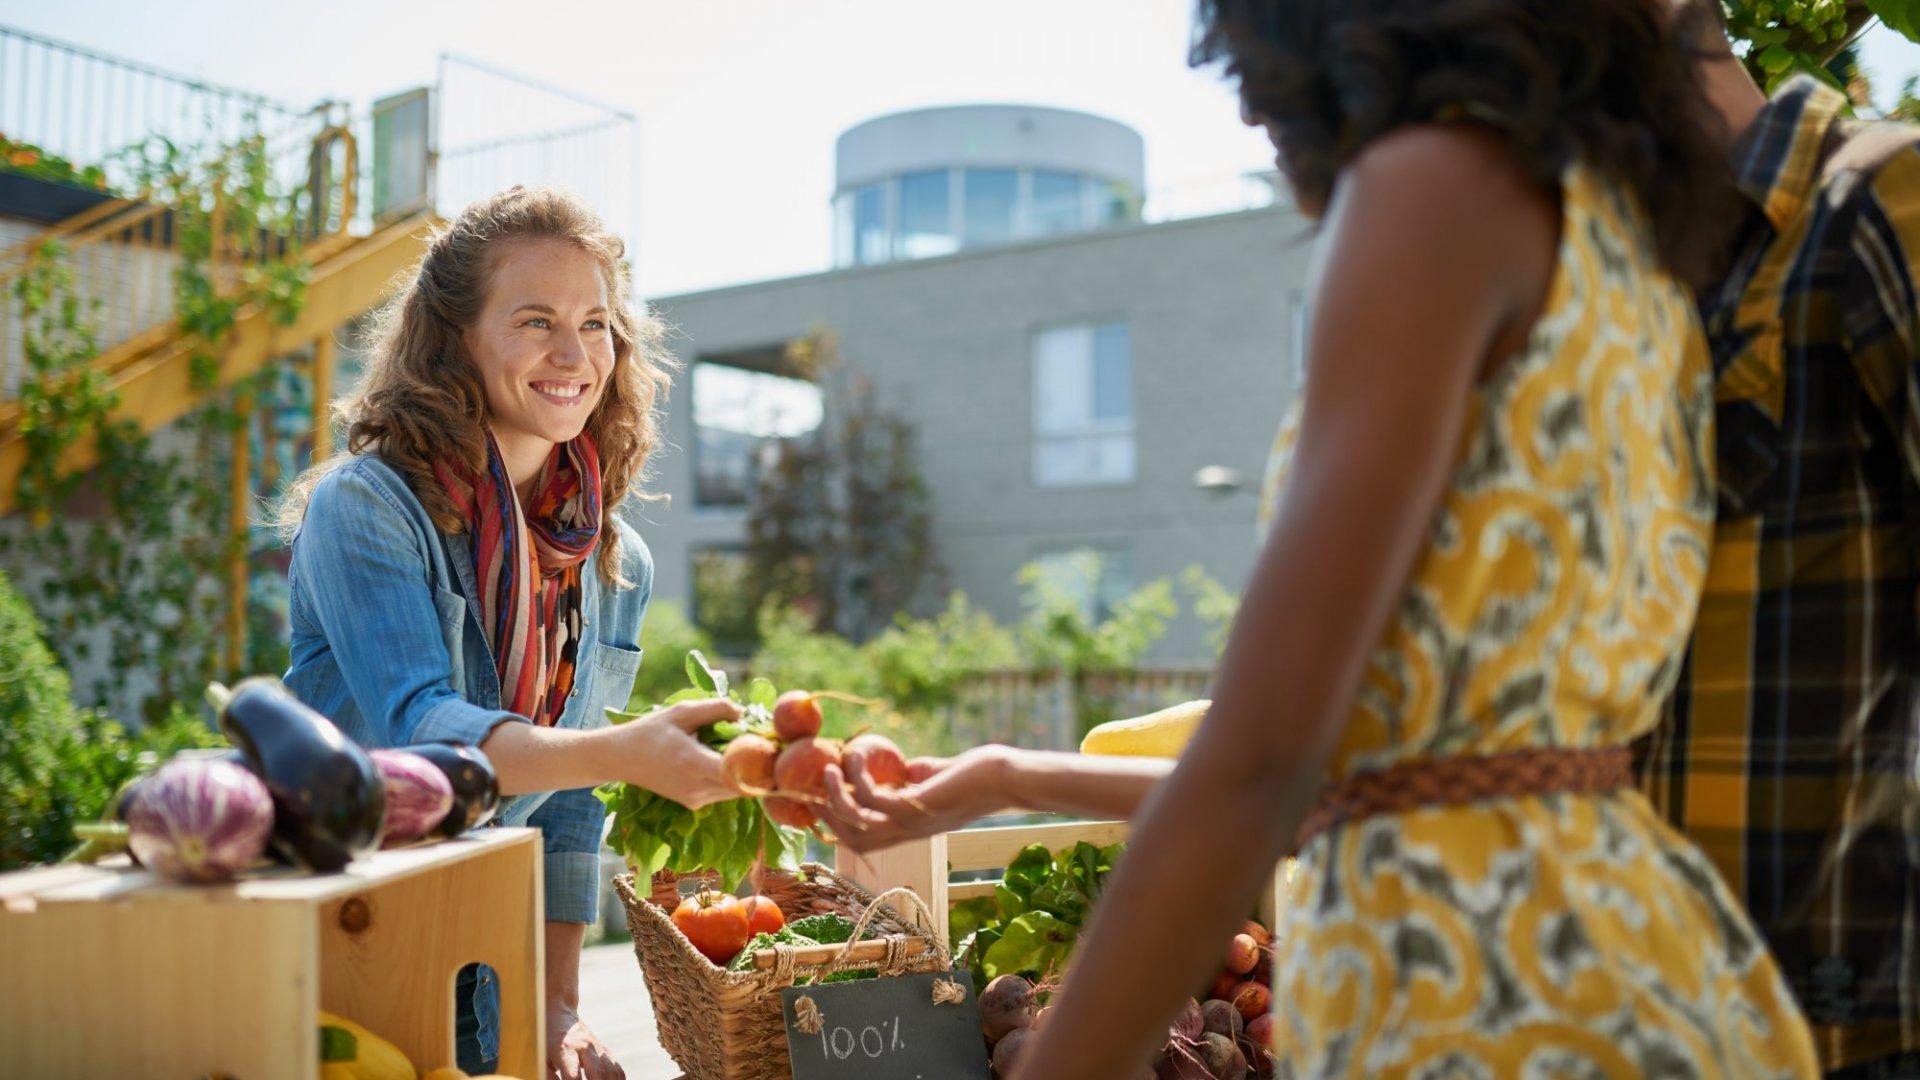 4 Inspirational Signs of Positive Entrepreneurial Adrenaline